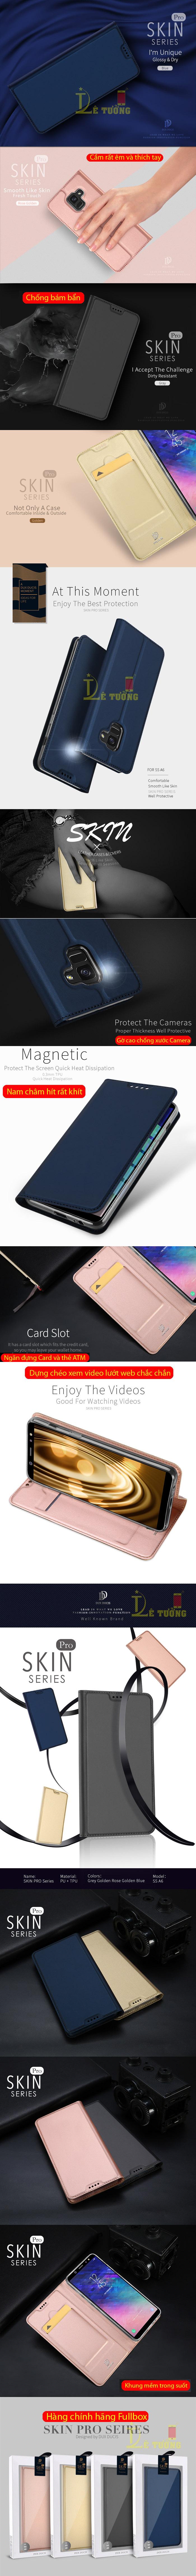 Bao da Galaxy A6 2018 Dux Ducis Skin siêu mỏng - khung mềm - mềm mịn 5